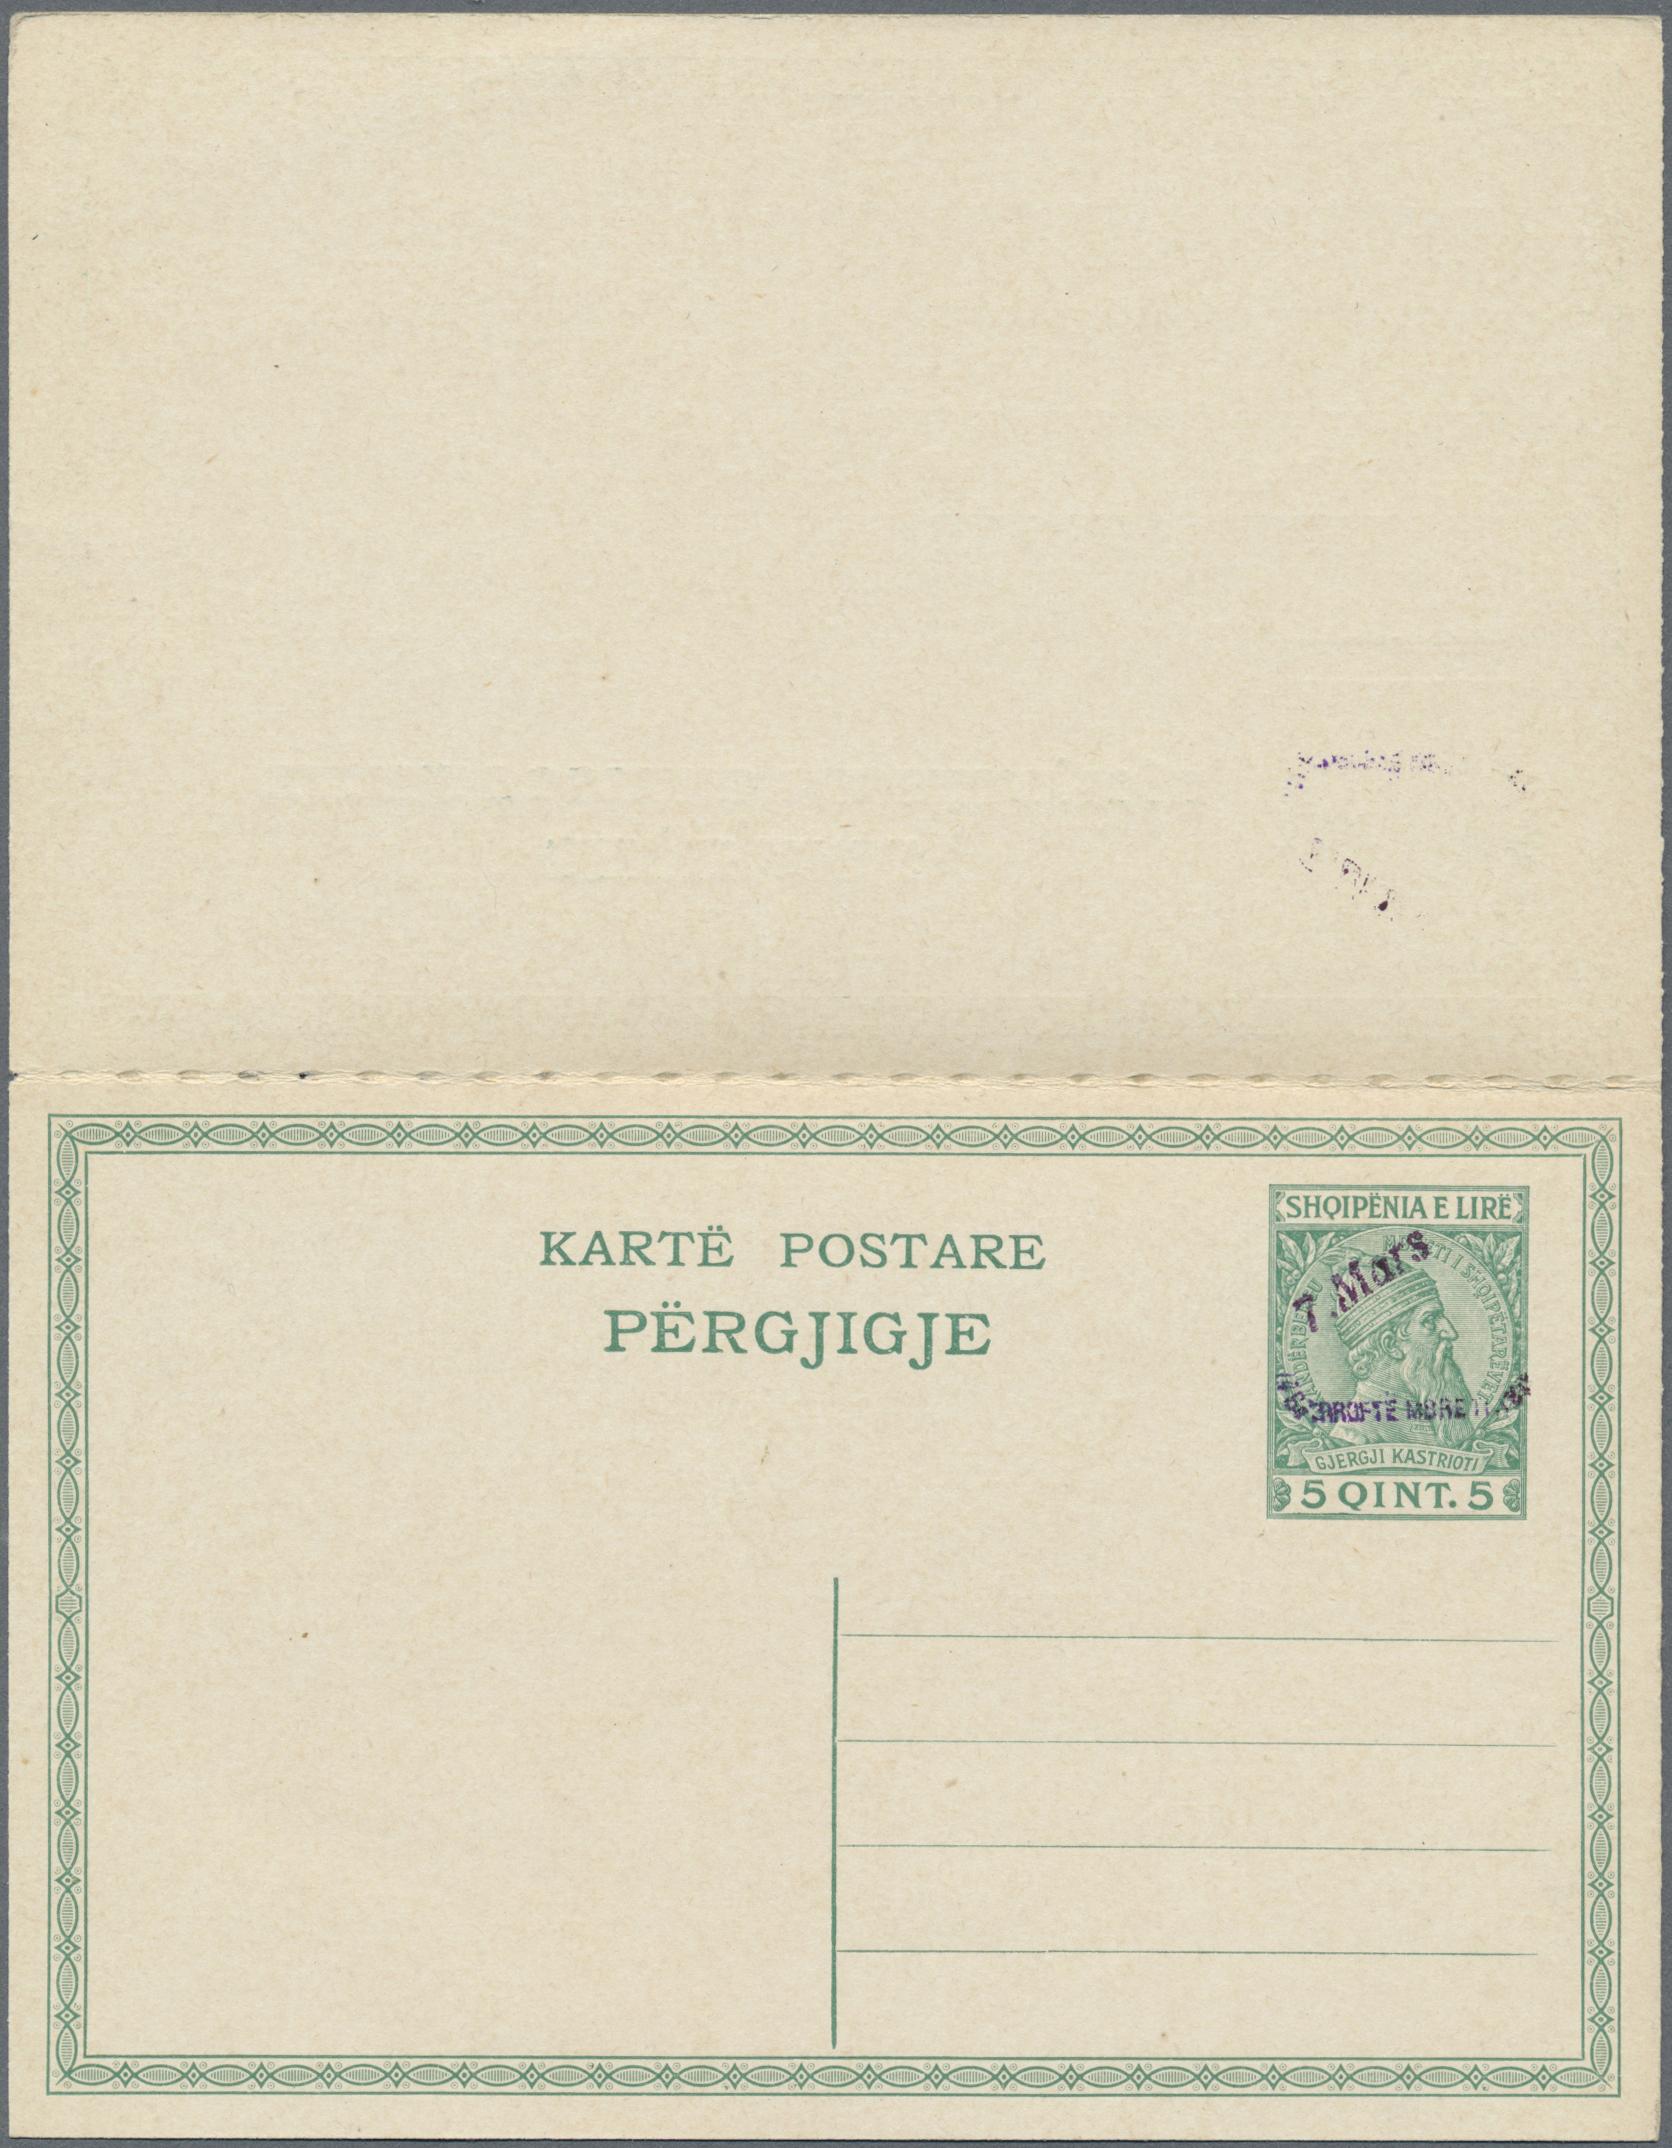 Lot 15565 - Albanien - Ganzsachen  -  Auktionshaus Christoph Gärtner GmbH & Co. KG Single lots Philately Overseas & Europe. Auction #39 Day 4